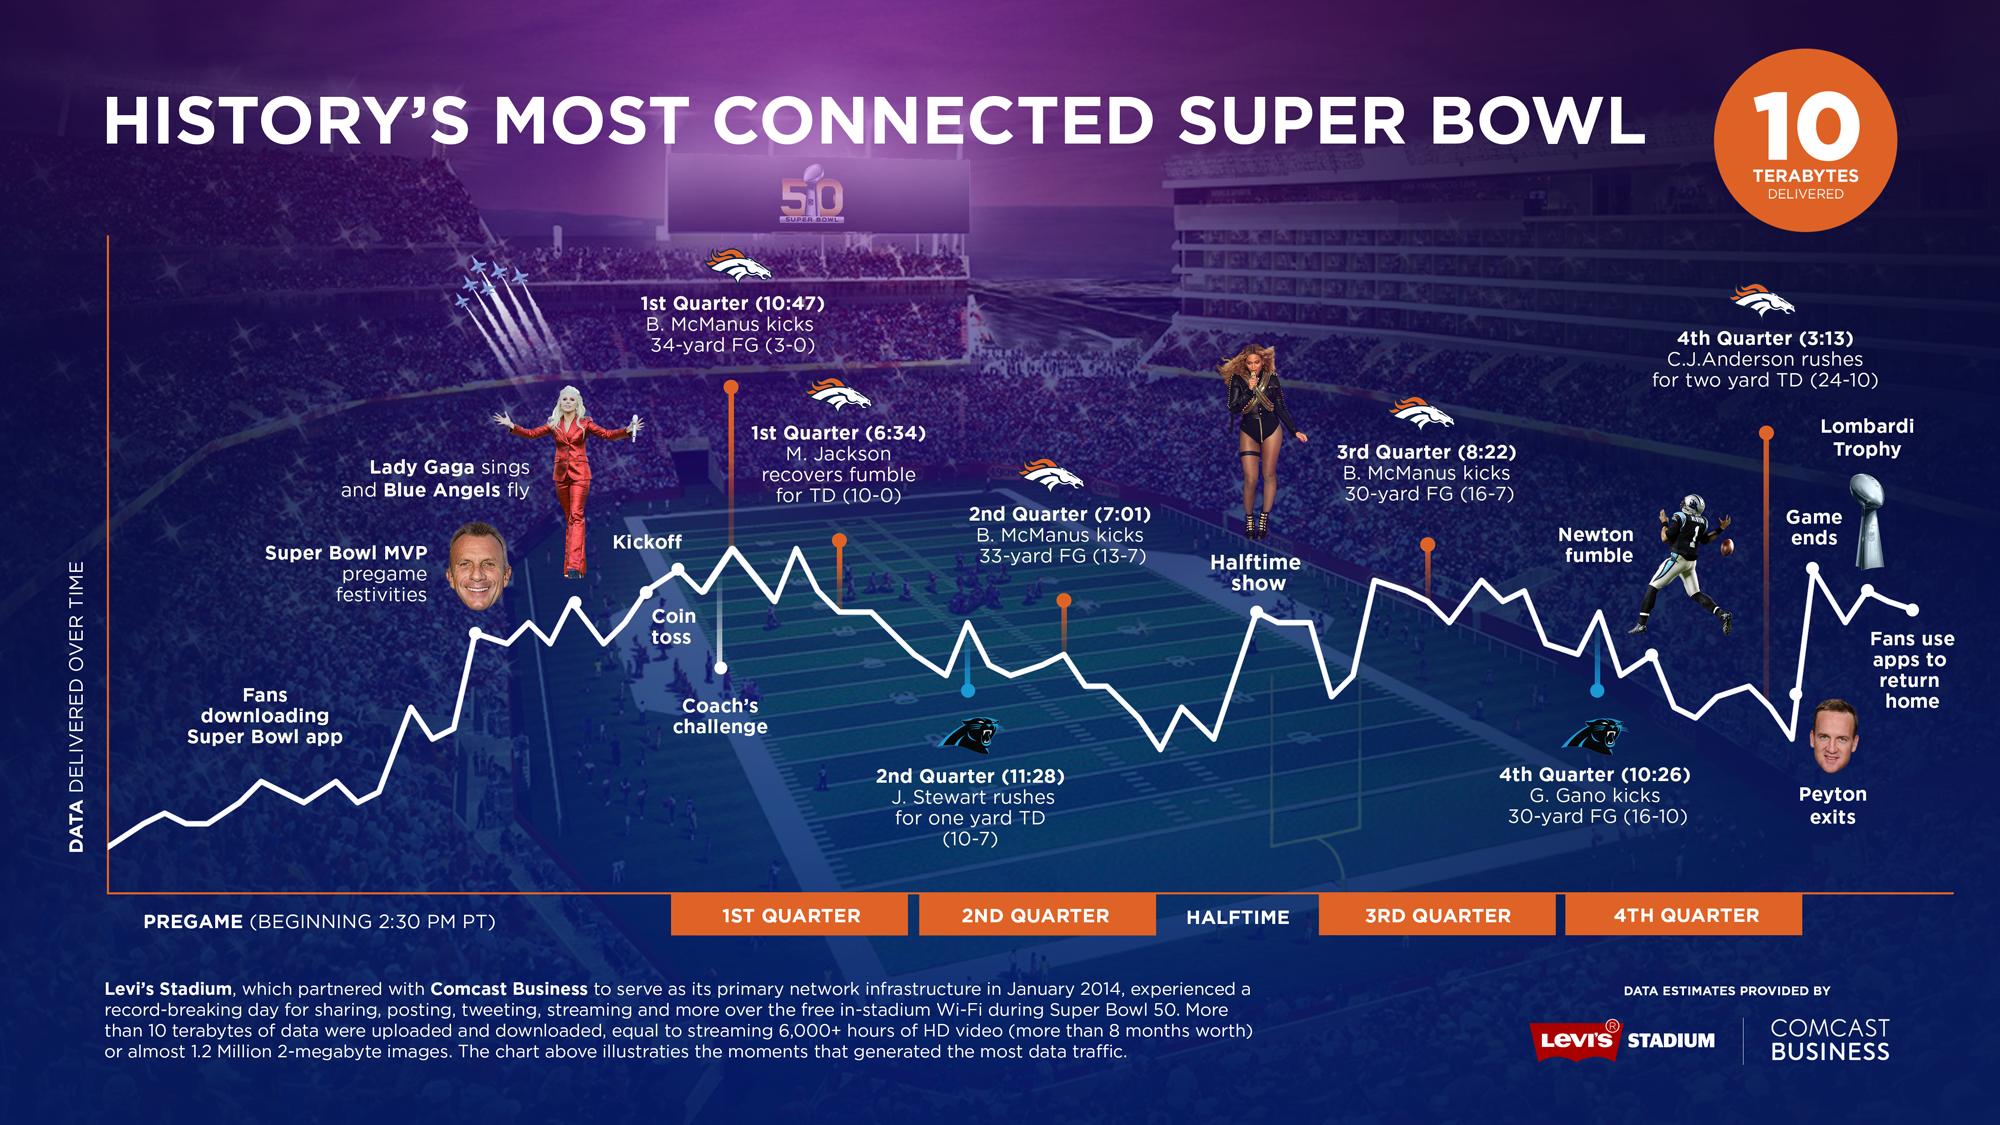 Superbowl-Comcast-Business-Levis-Stadium-Infographic-Final